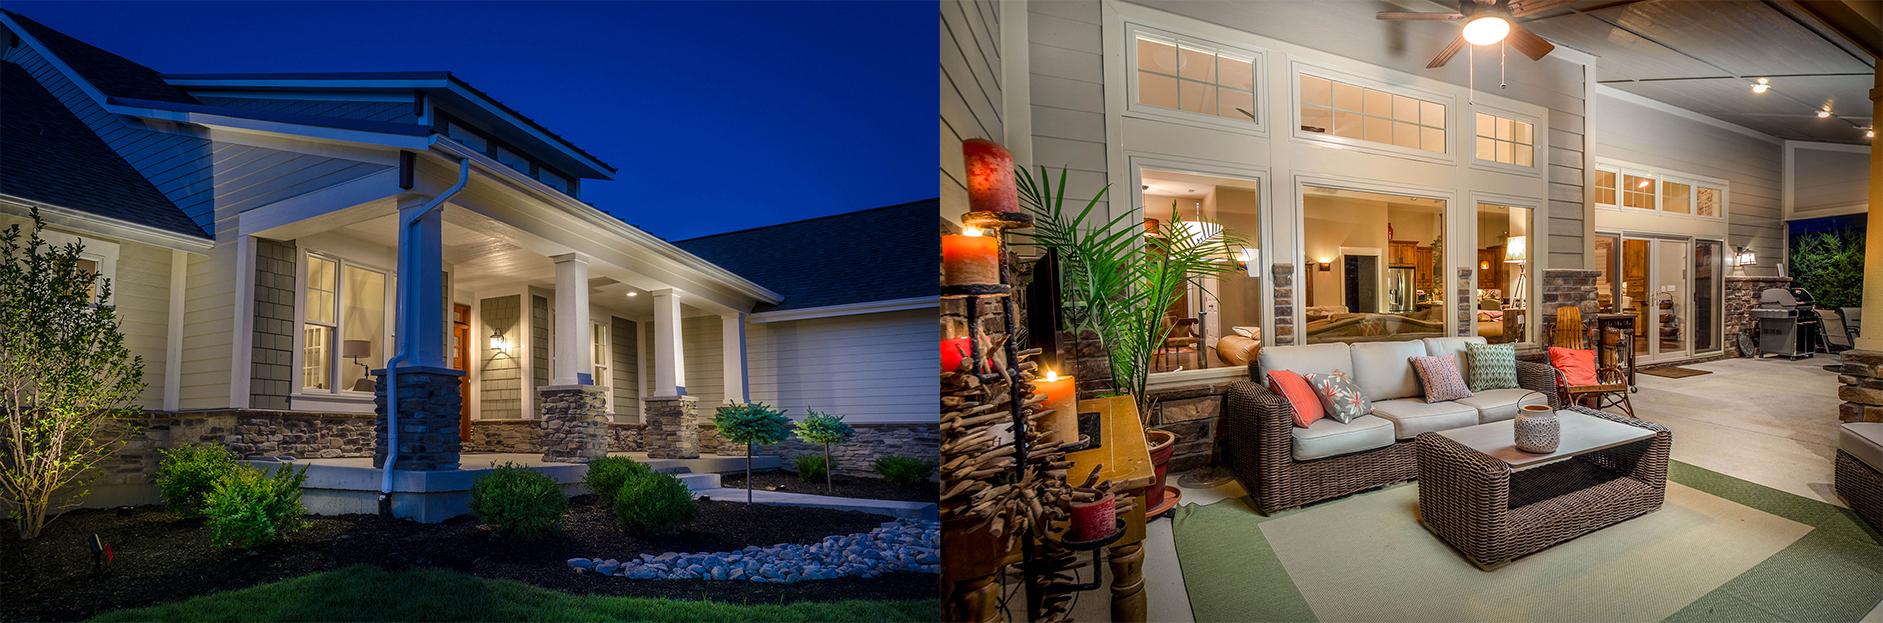 Custom lighting at Design Homes and Development.